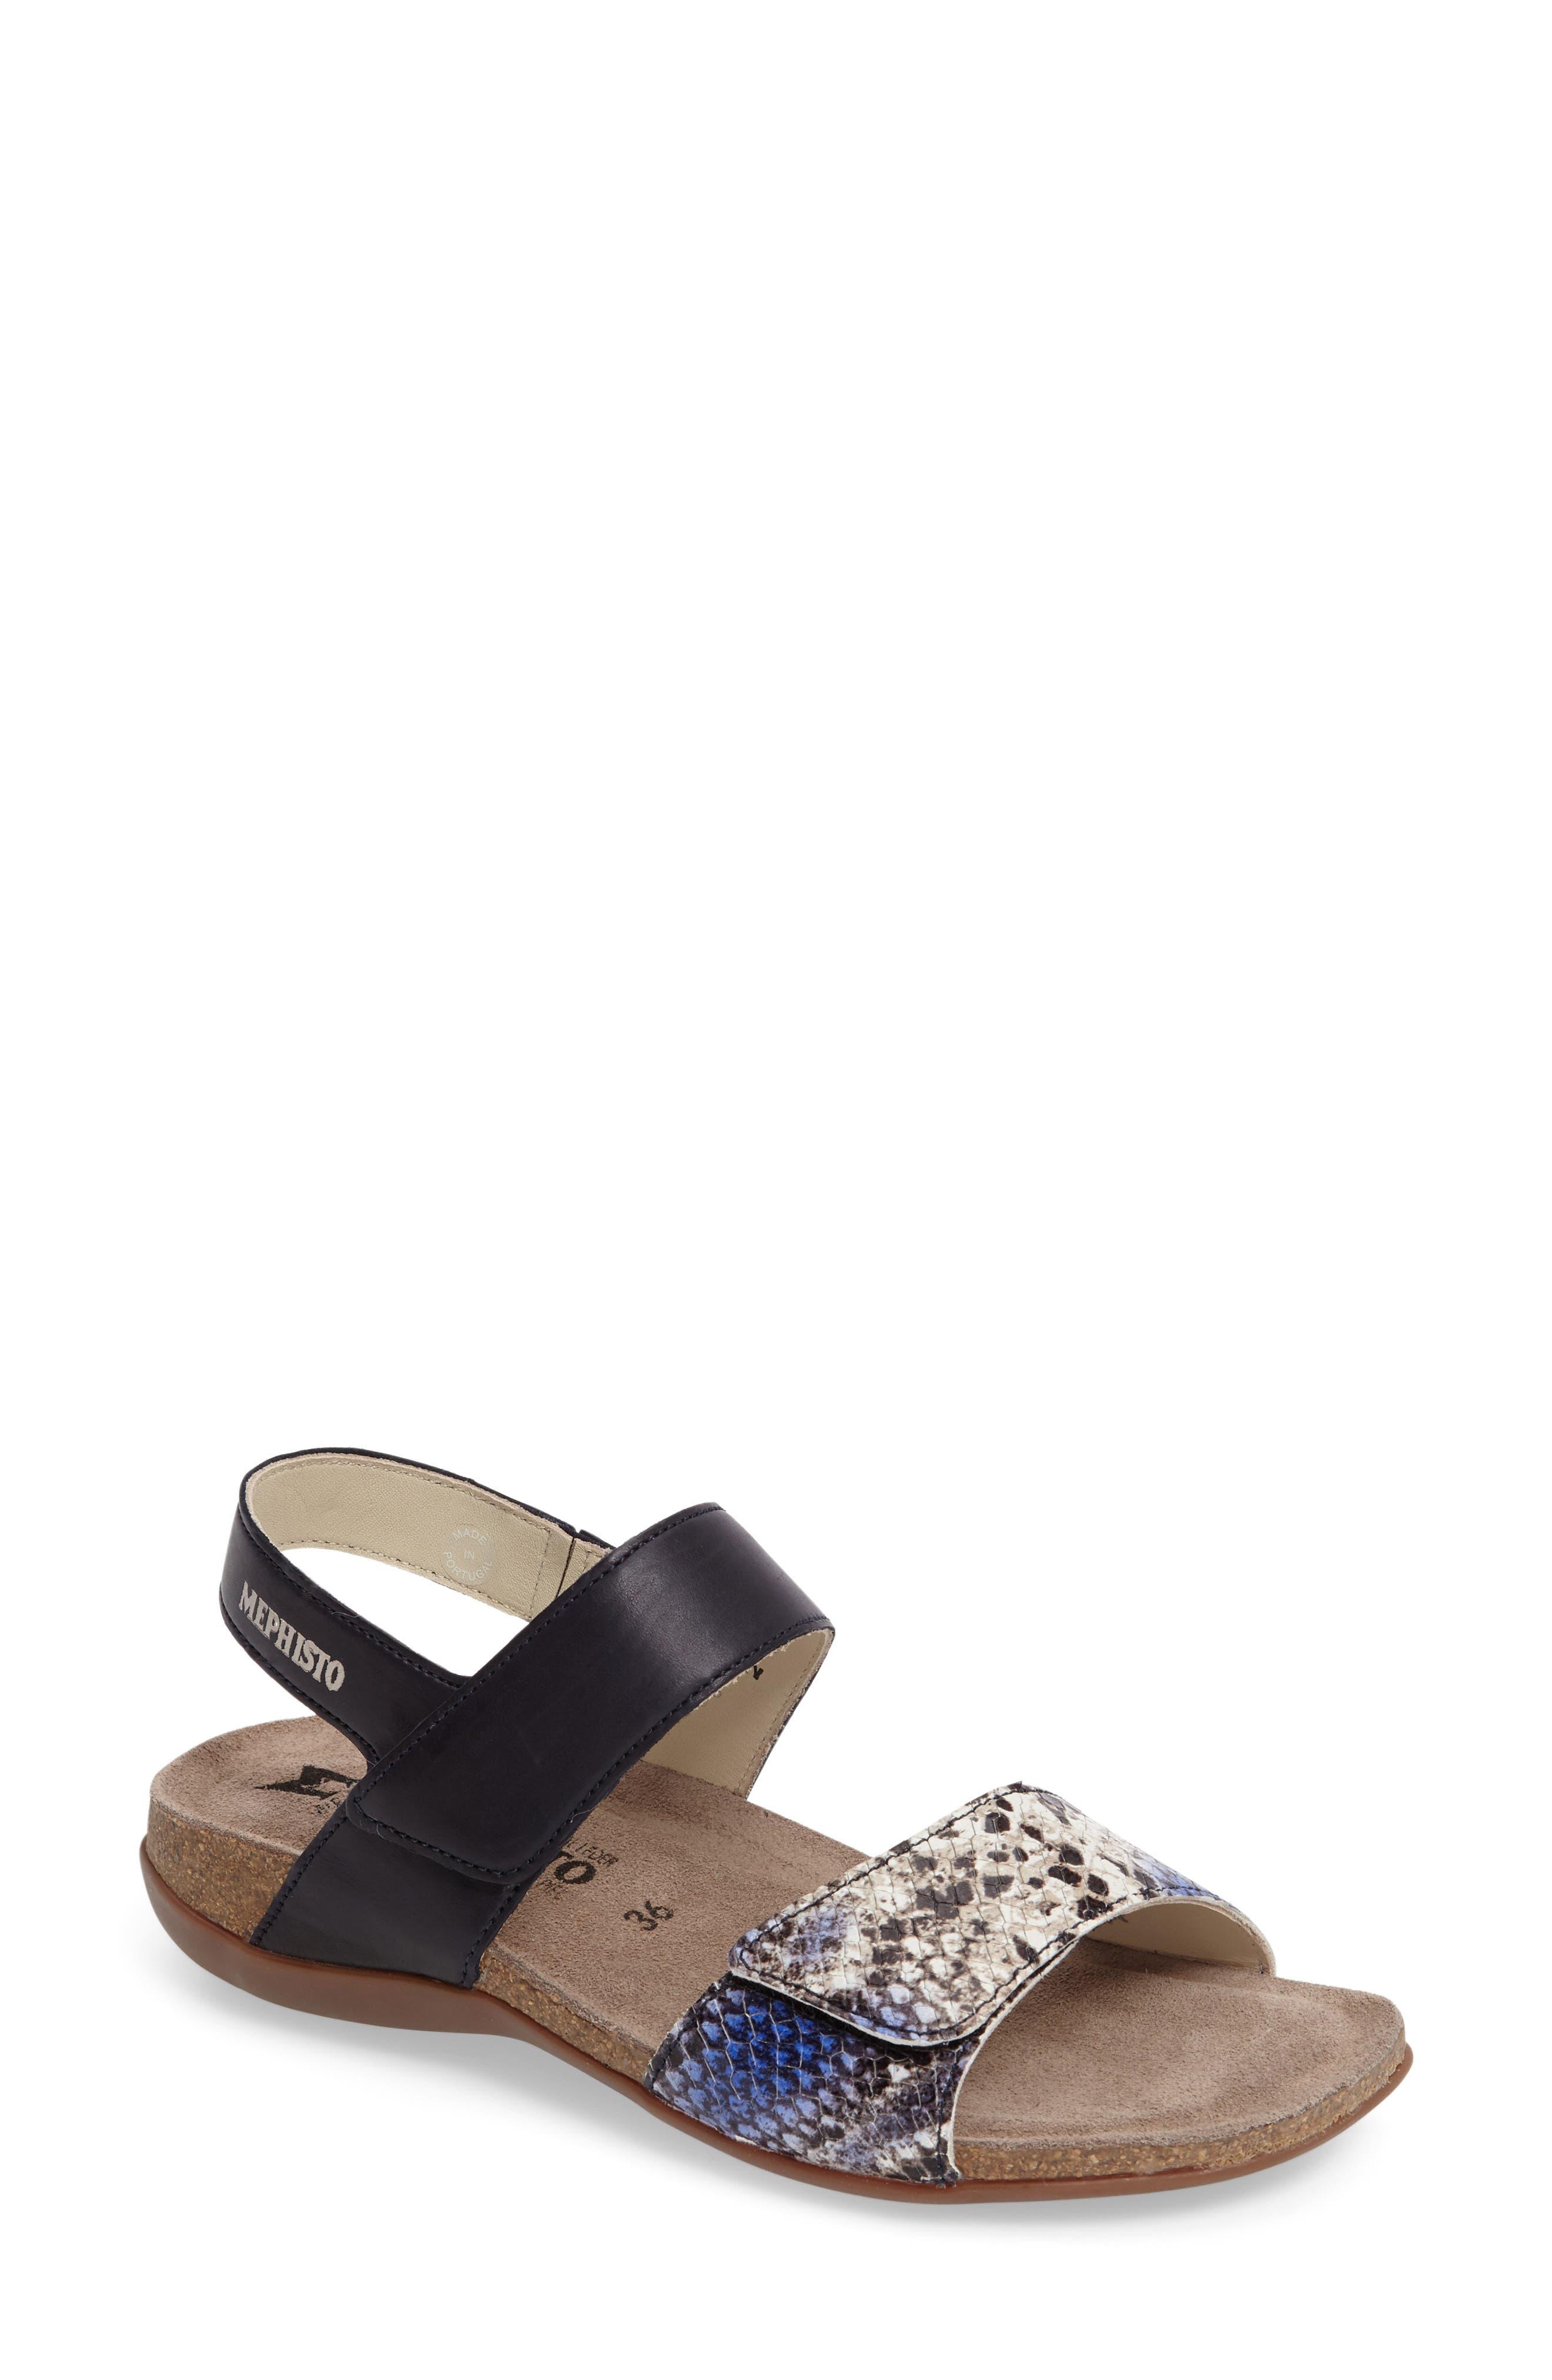 Main Image - Mephisto 'Agave' Sandal